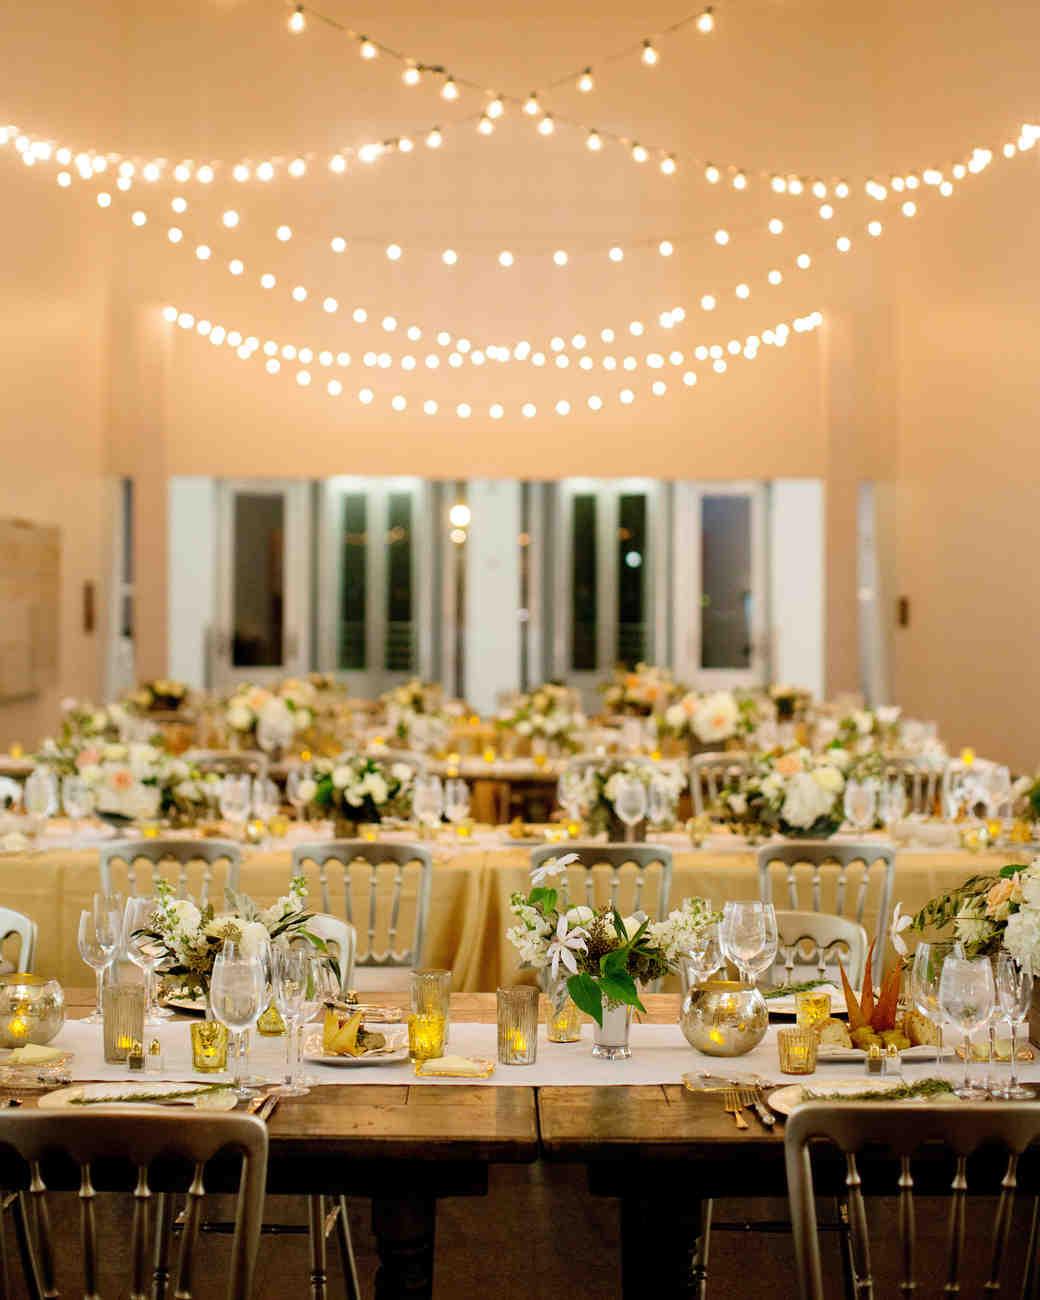 aiasha-charles-wedding-table-0514.jpg